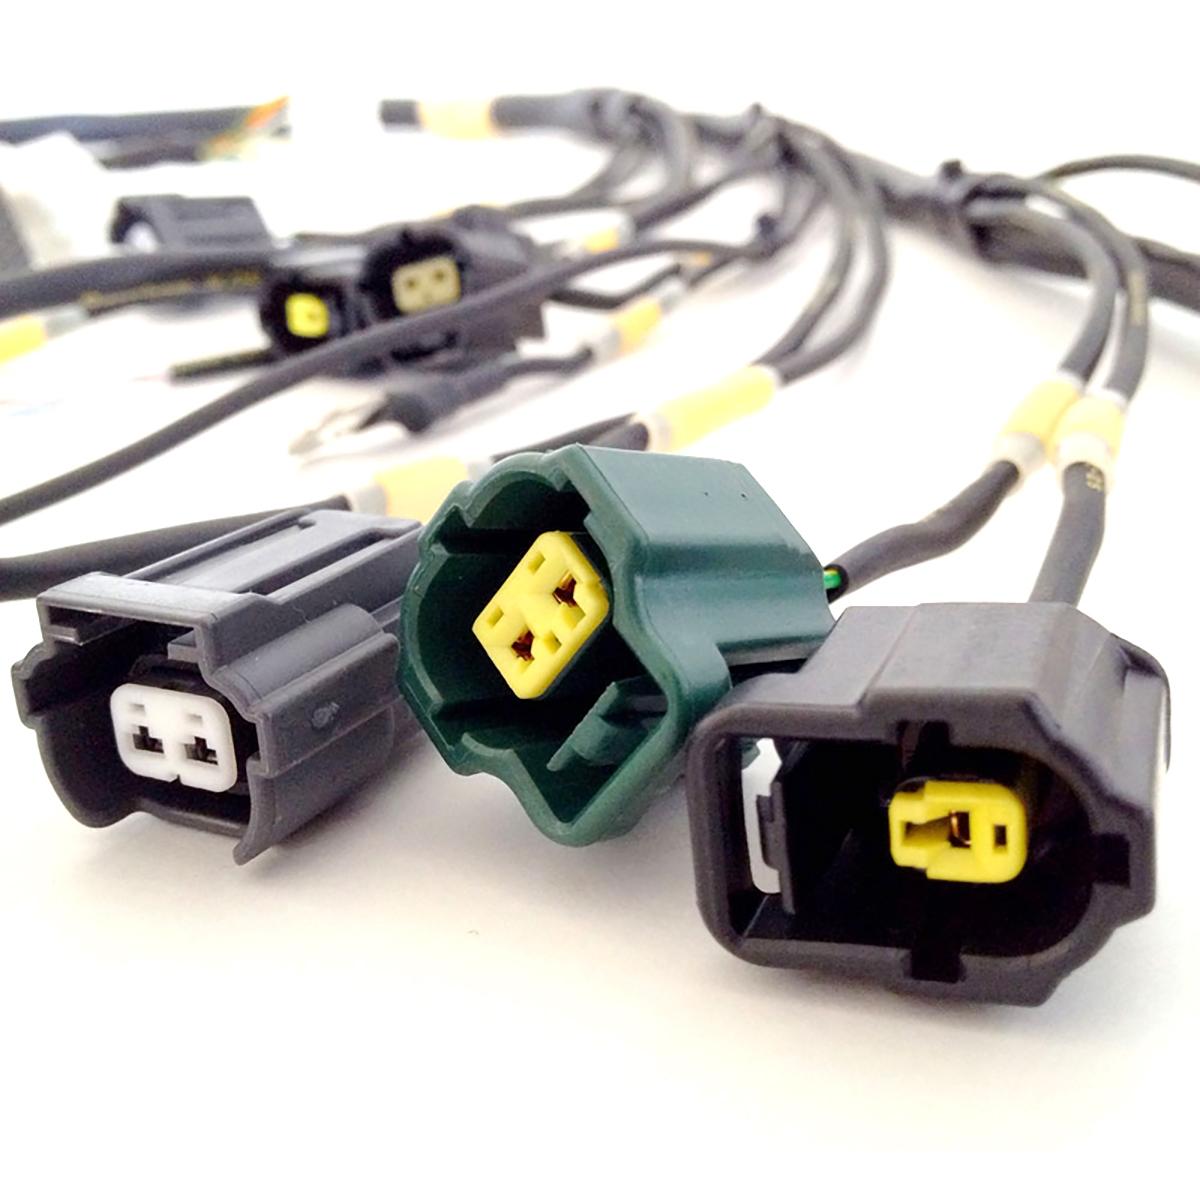 hight resolution of 1993 mazda rx7 wiring harness wiring library 1993 mazda rx 7 wiring harness